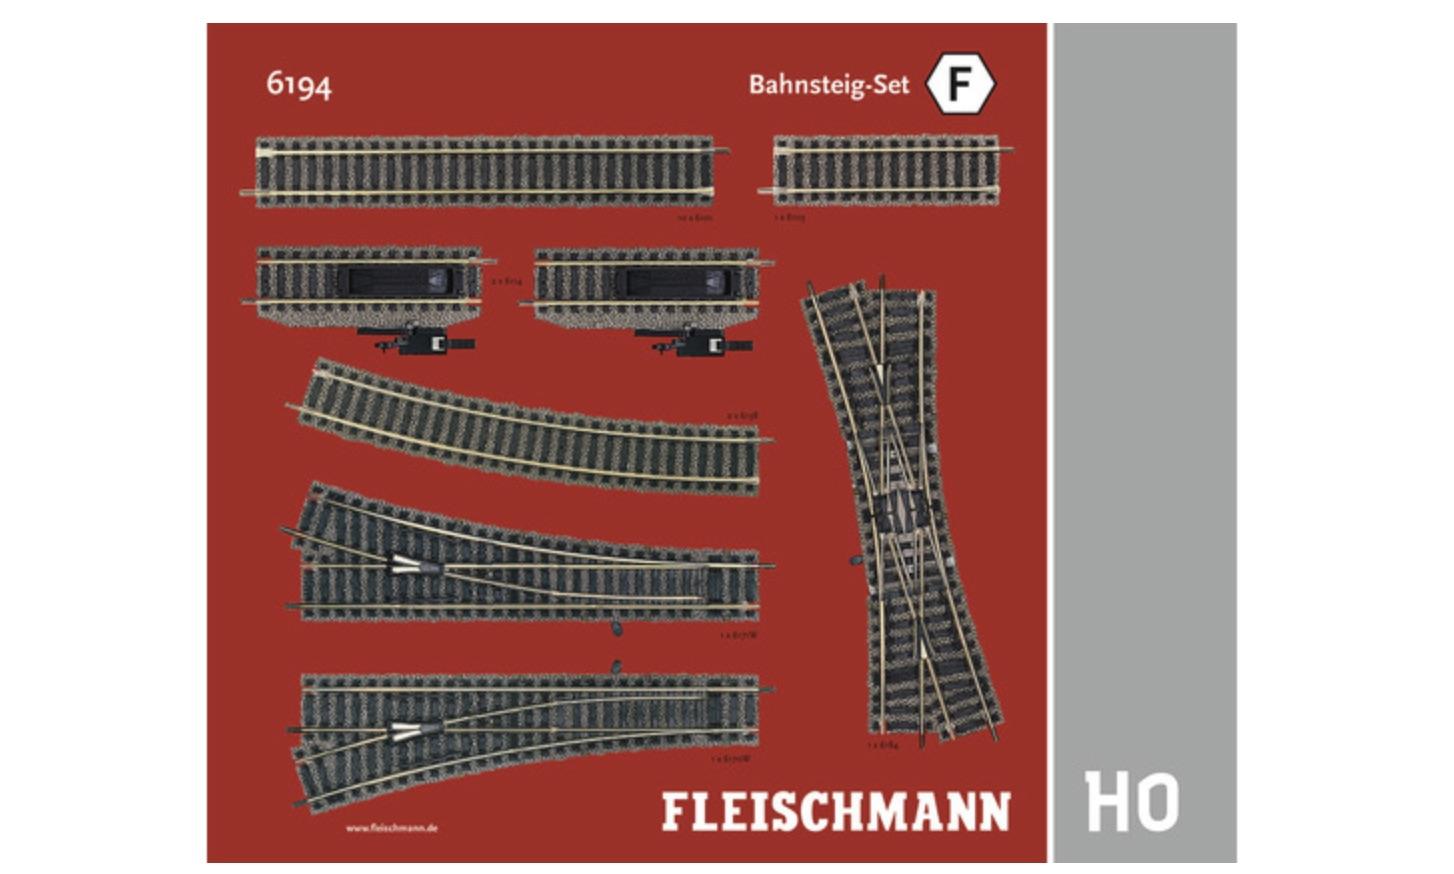 Fleischmann Discontinuing HO Track System